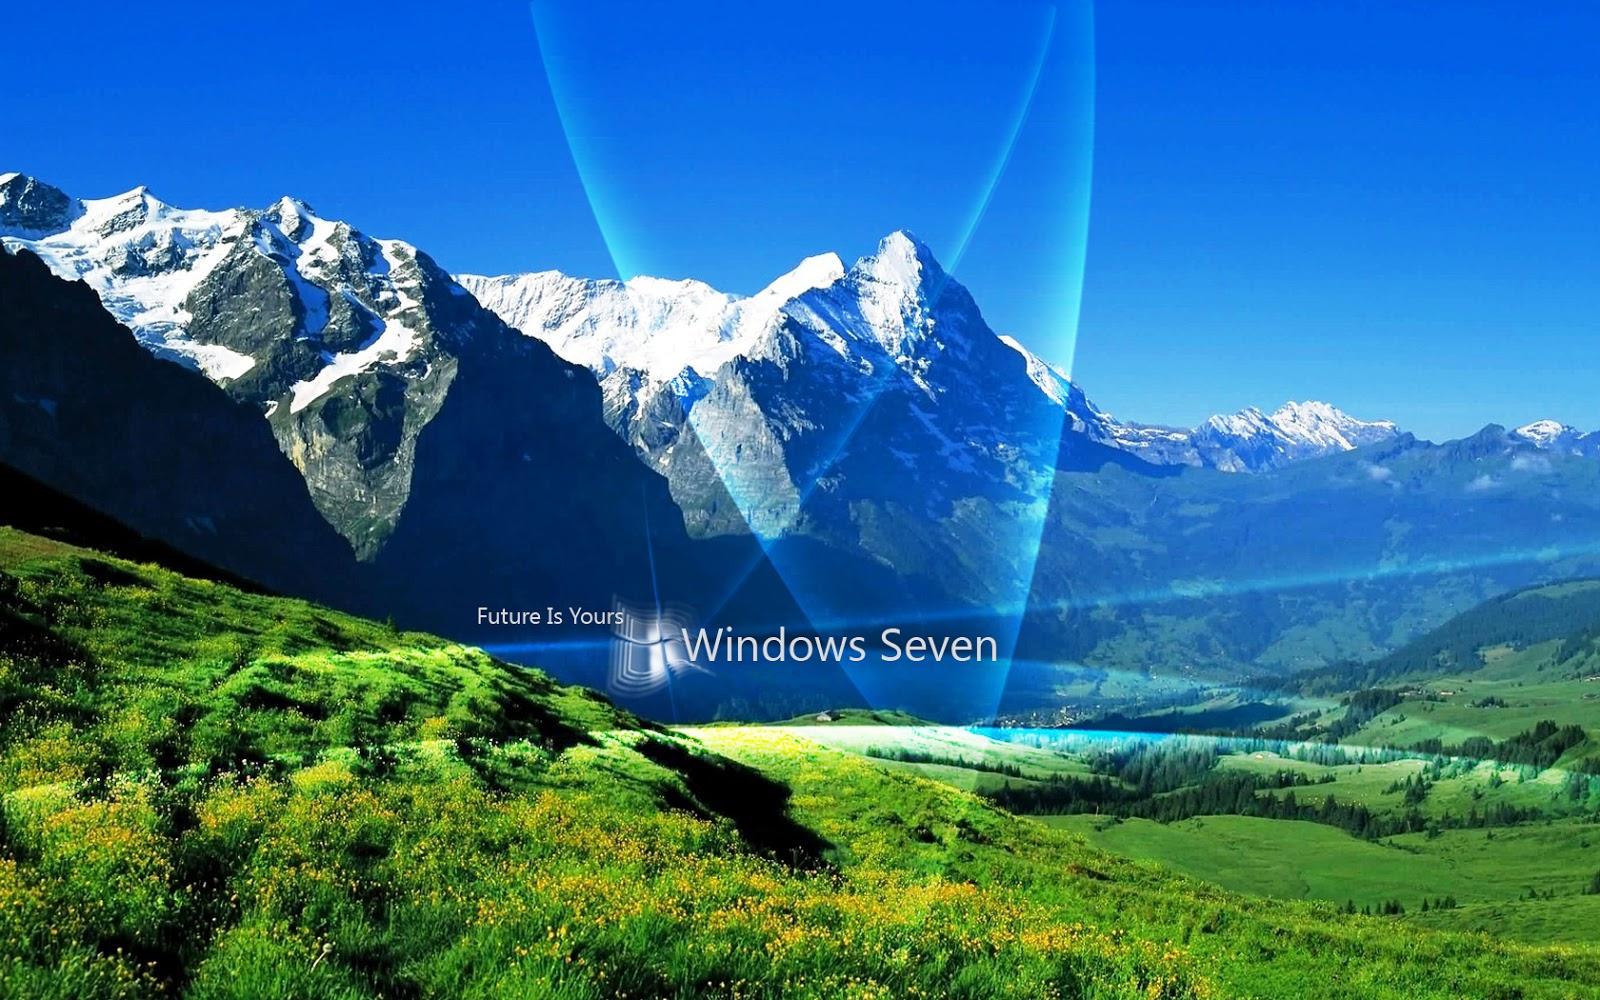 http://1.bp.blogspot.com/-IYbLV_da6_k/TelTydWb7dI/AAAAAAAAAEk/1vKsBCYZ9xQ/s1600/sfondi_hd_windows_7_20110102_1876545366.jpg